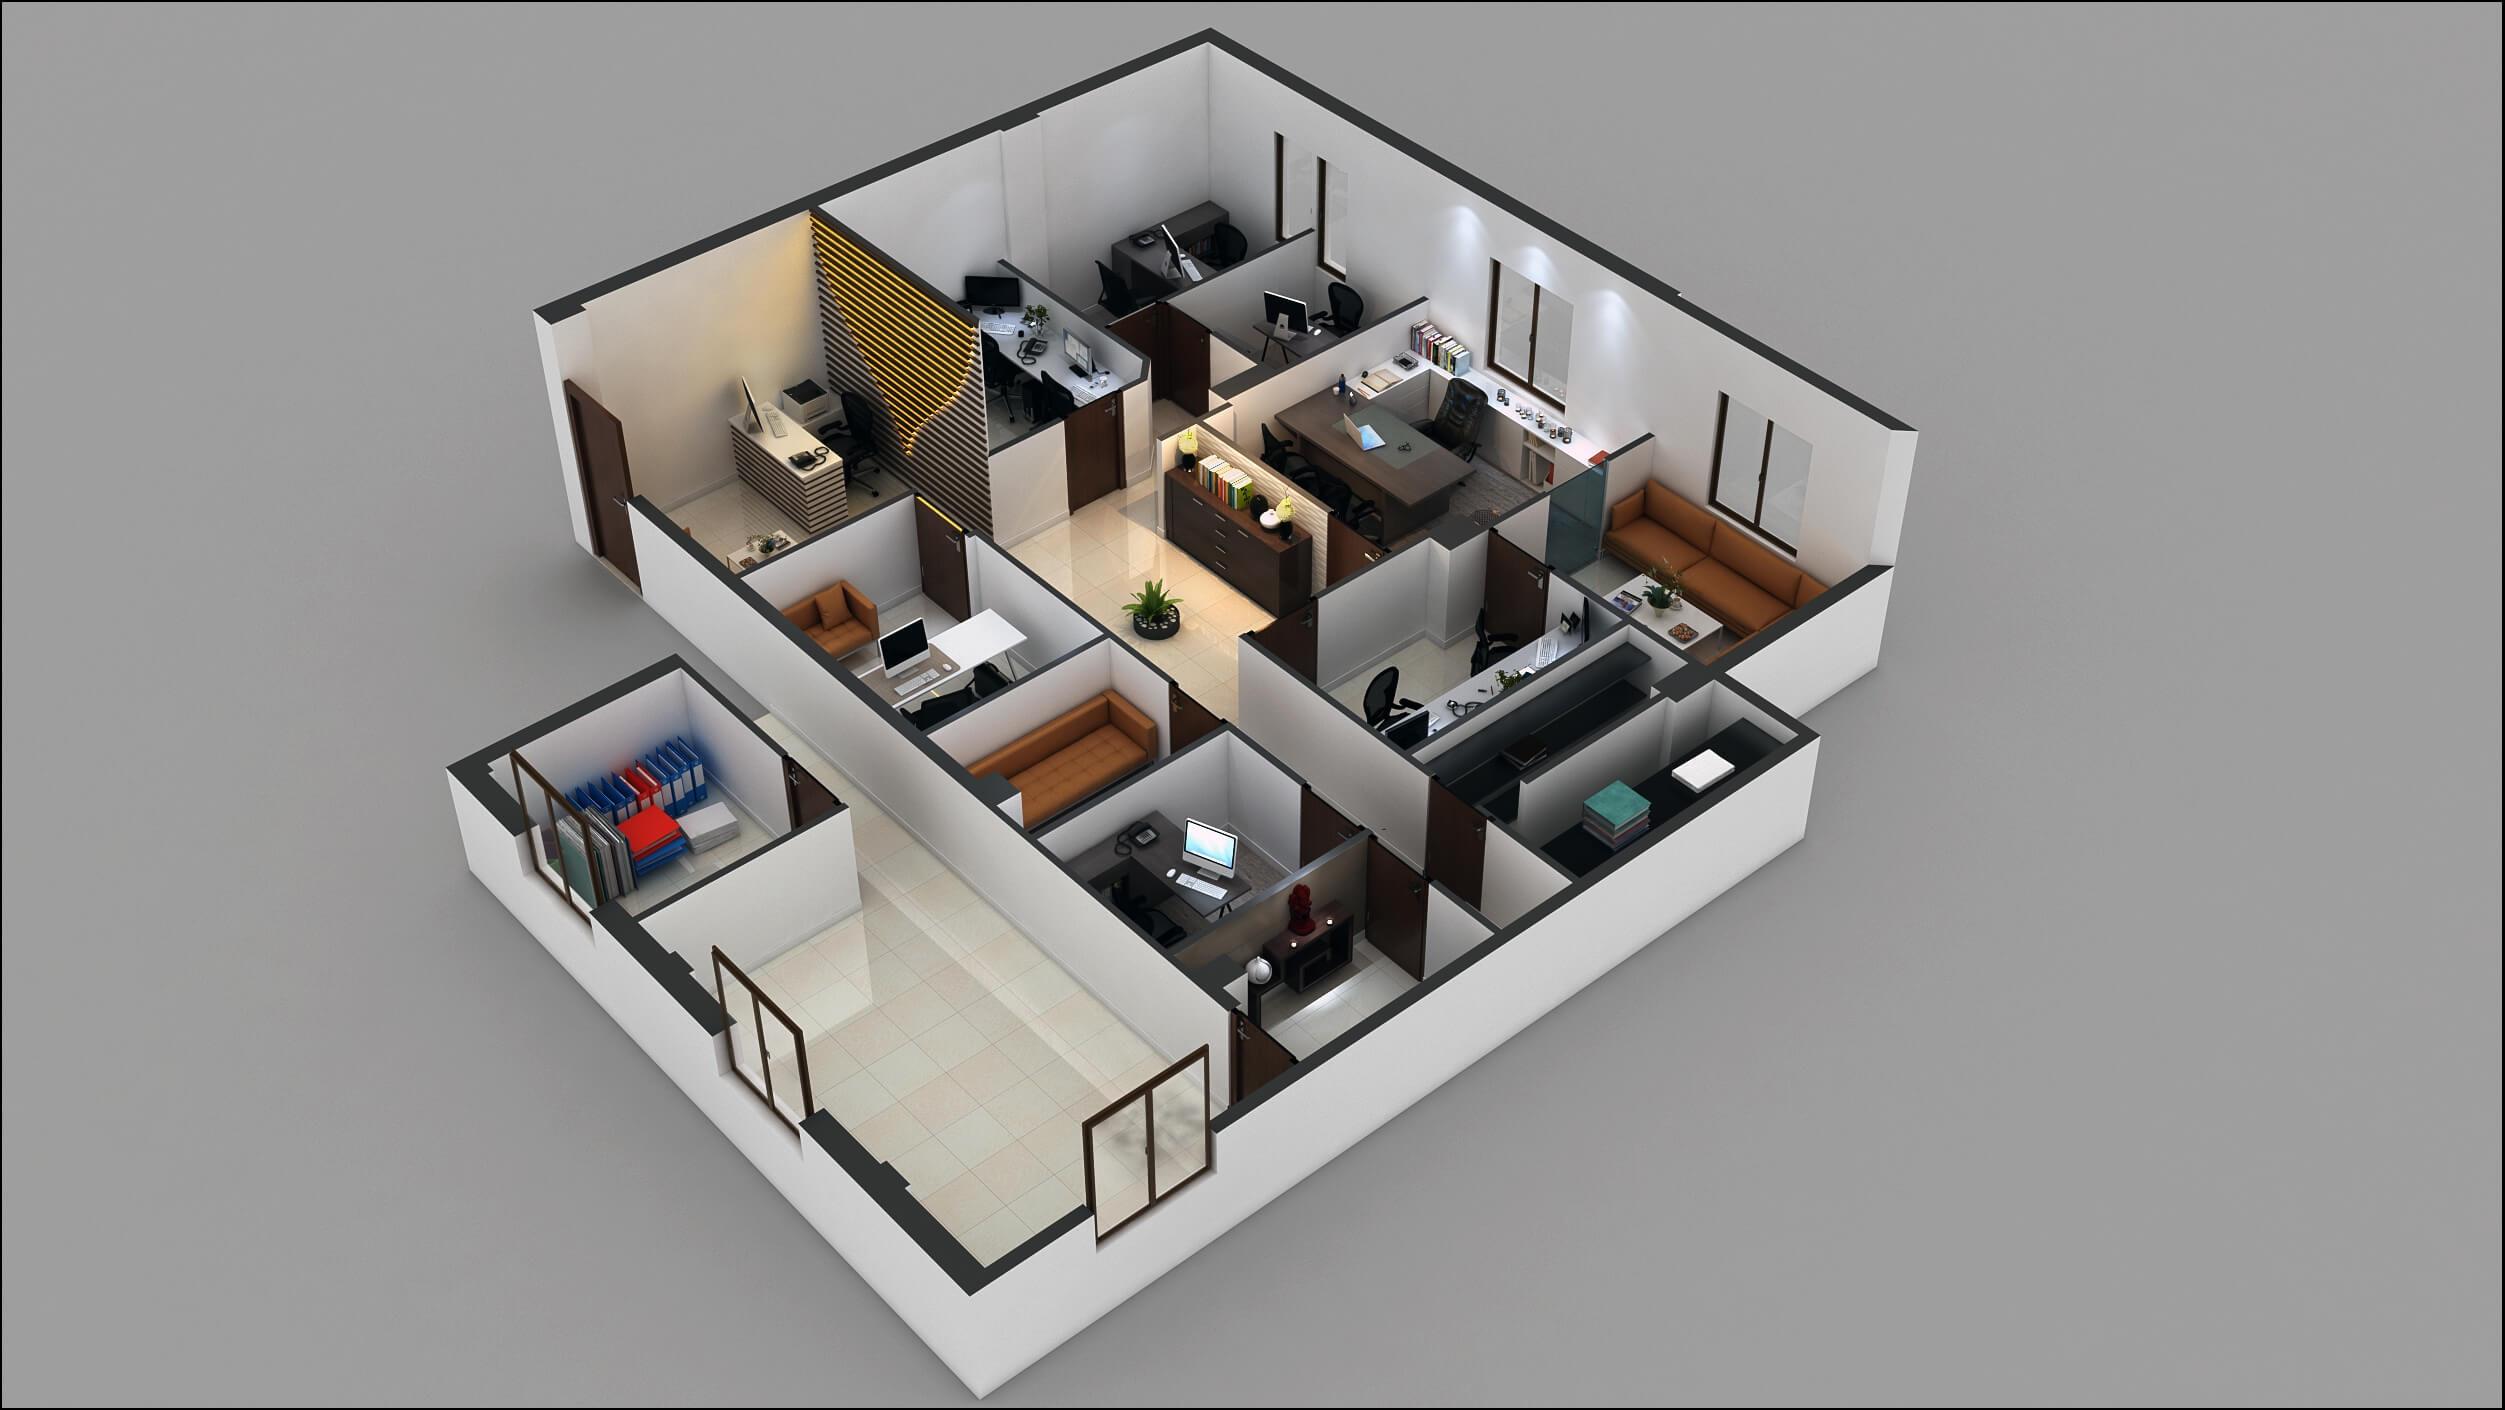 office floor plan design. office floor plan design